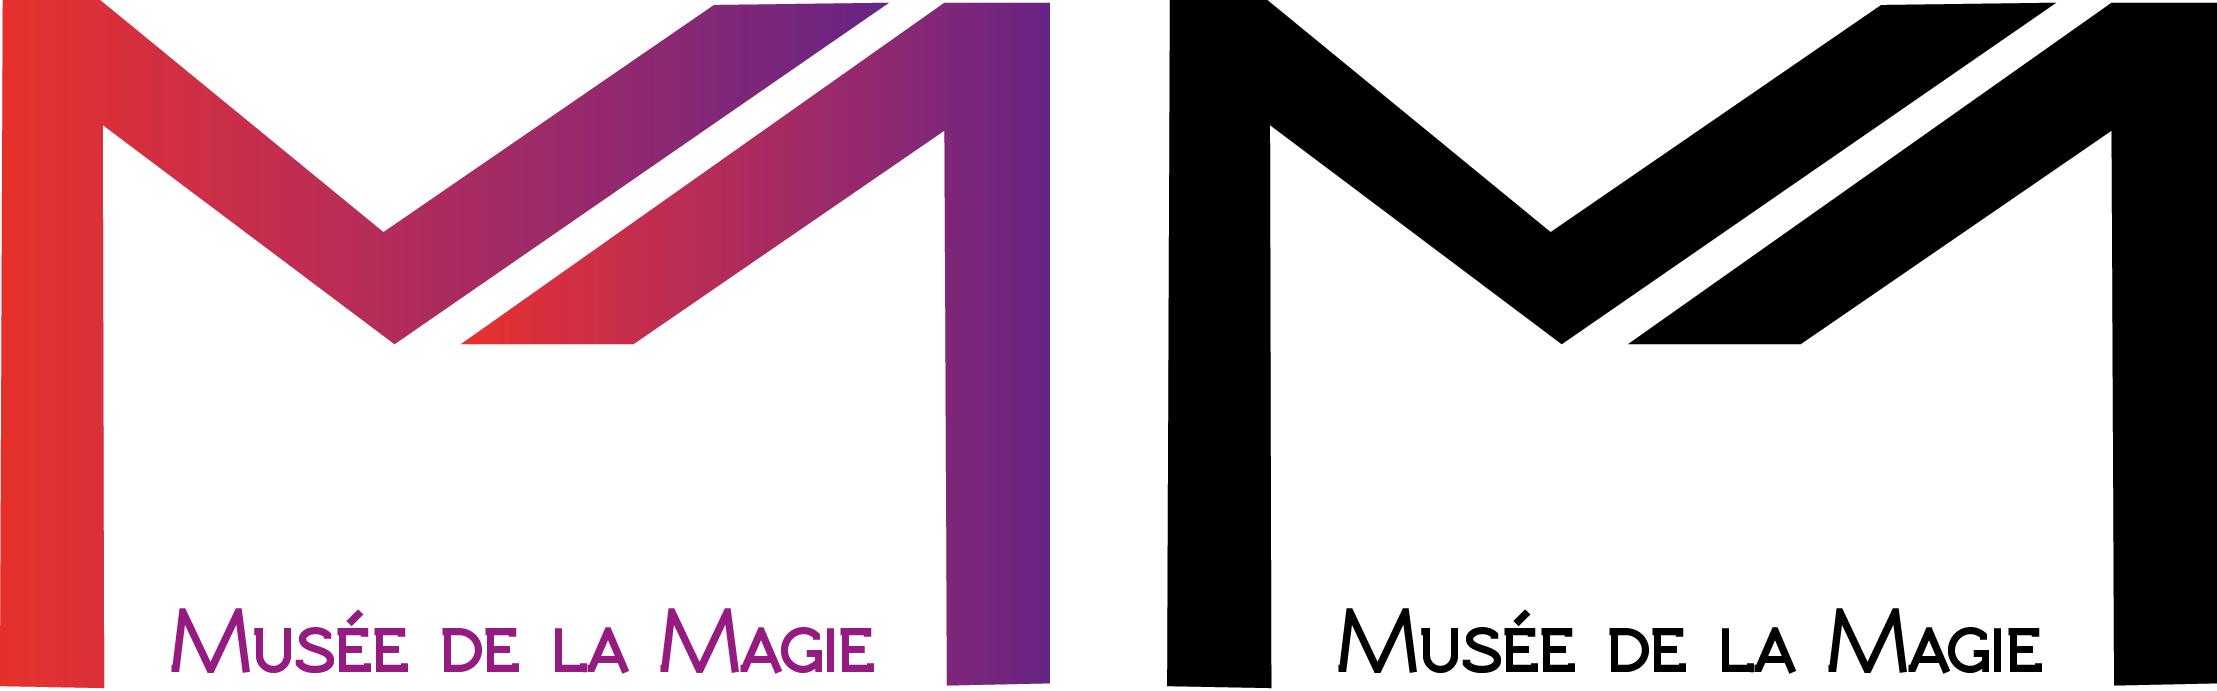 logo-musée-magie